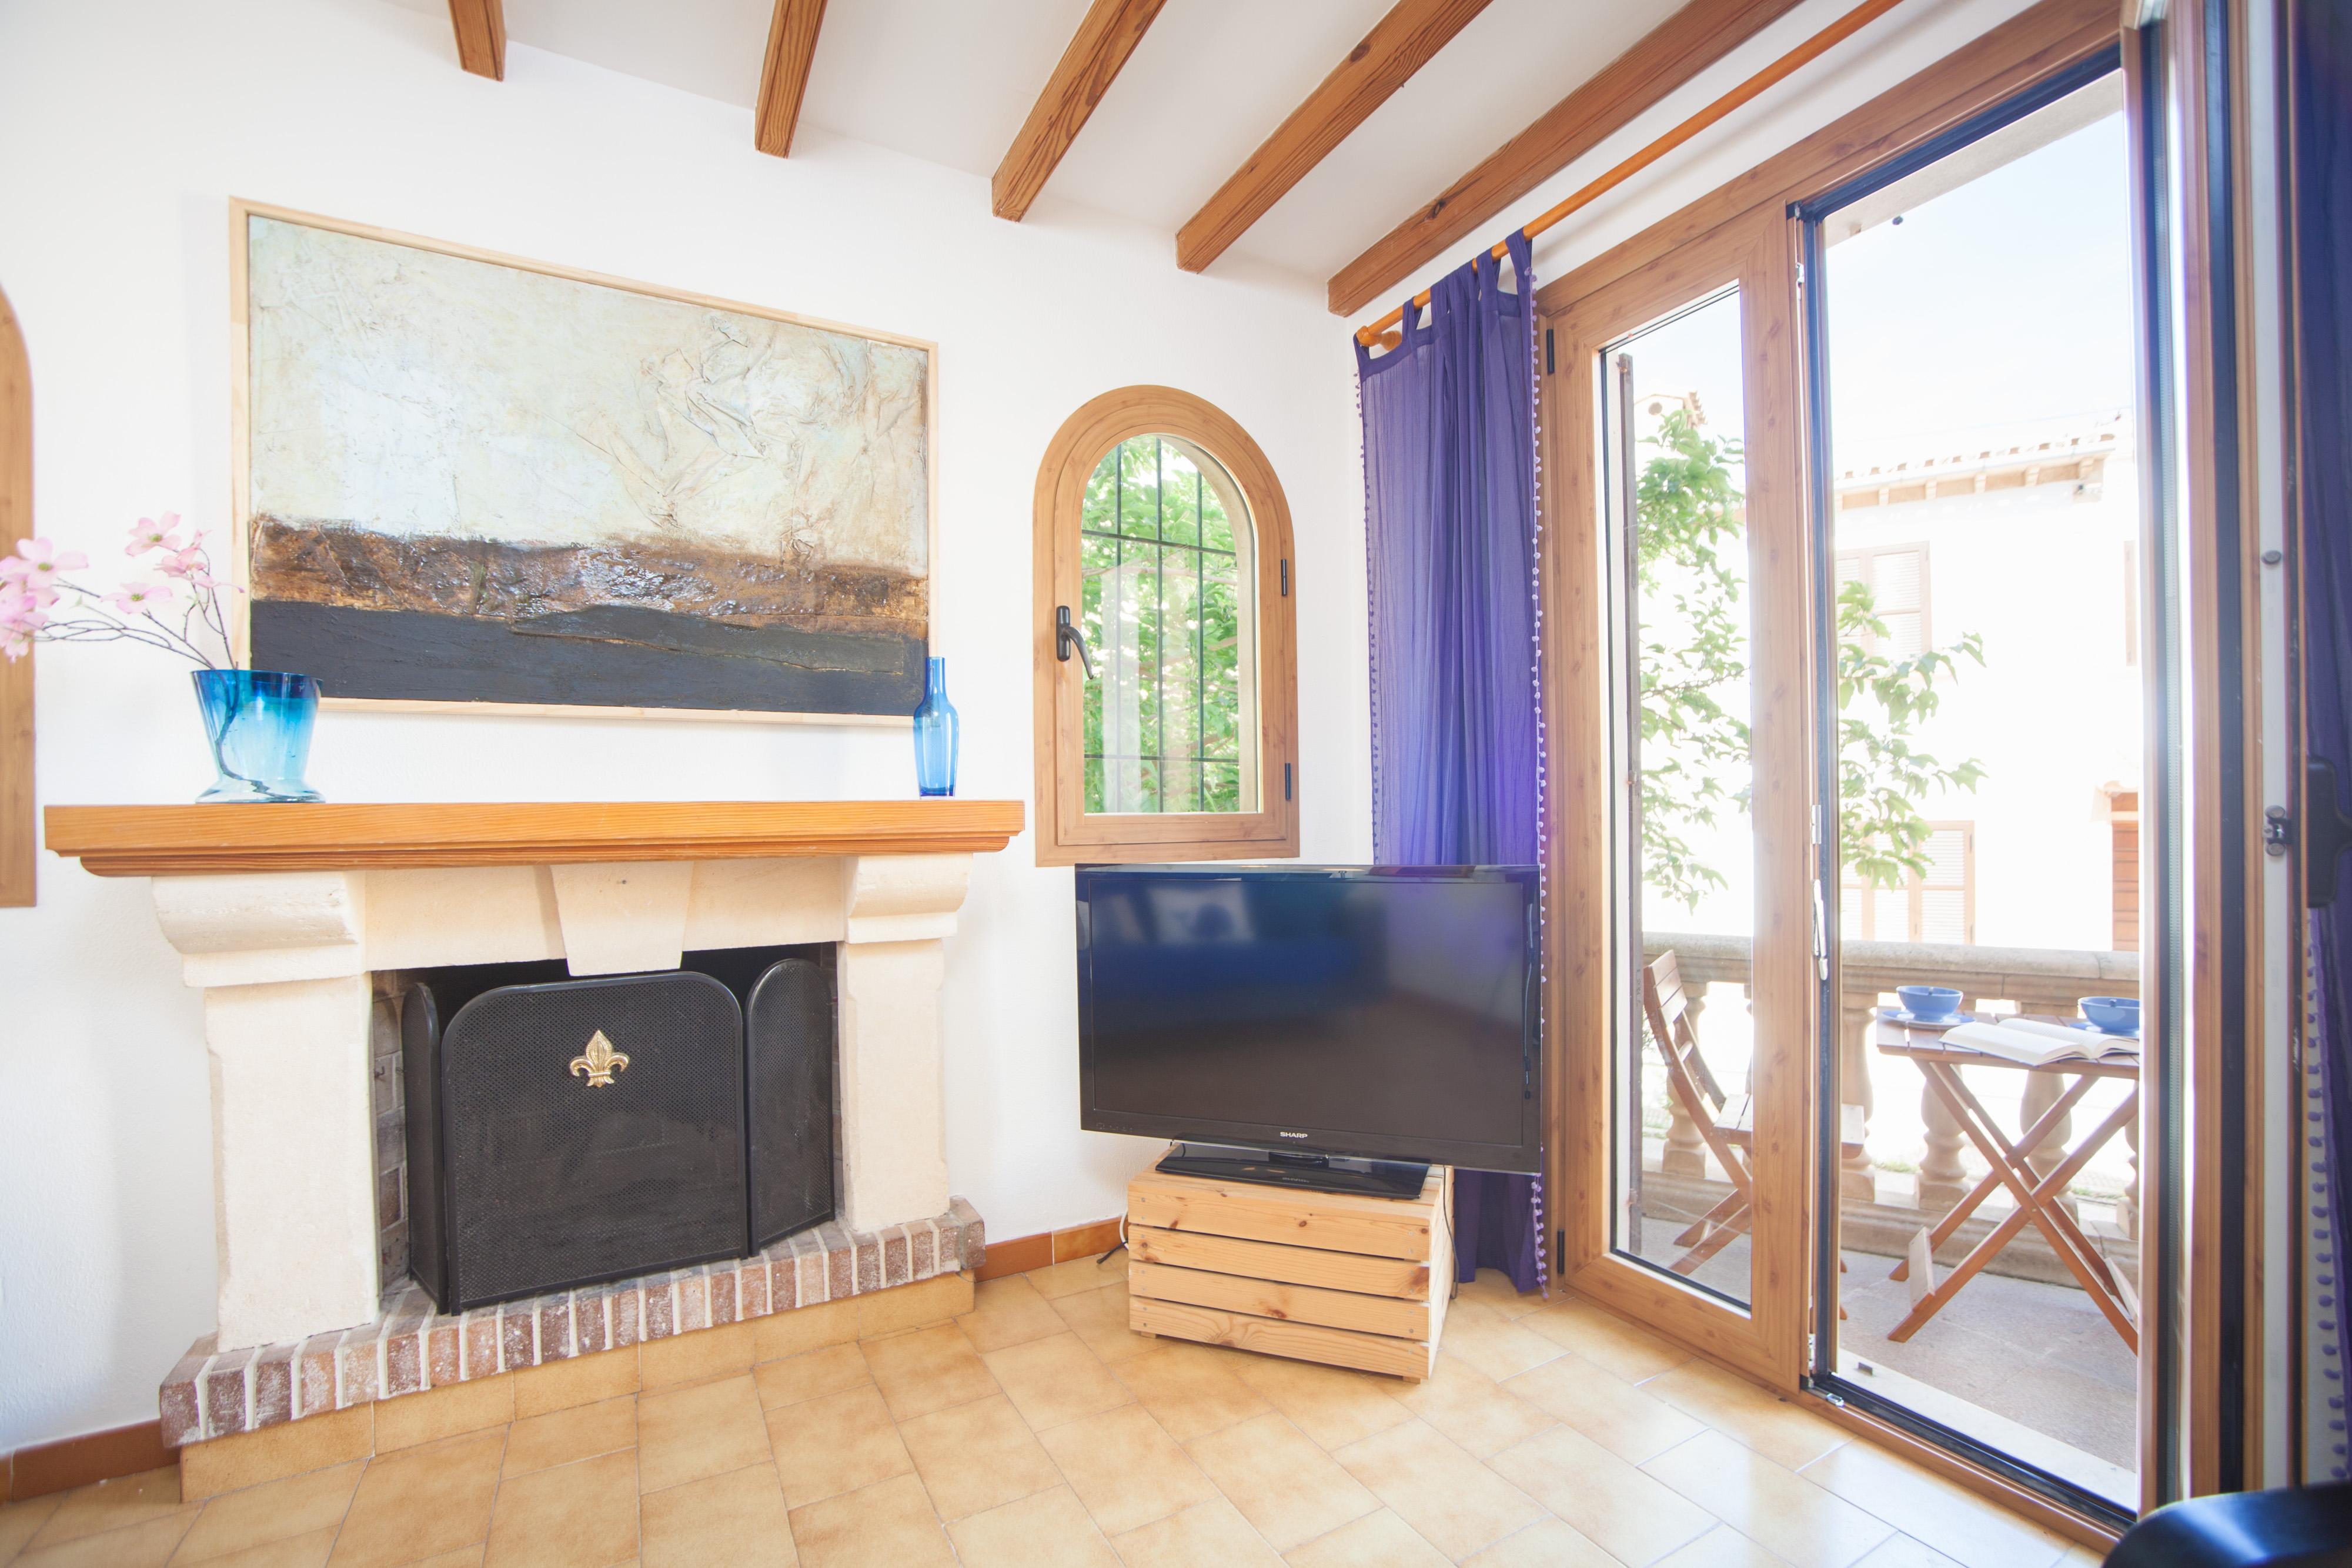 Ferienhaus CAN CUSSÓ SANSÓ (2198042), Colonia de Sant Pere, Mallorca, Balearische Inseln, Spanien, Bild 9